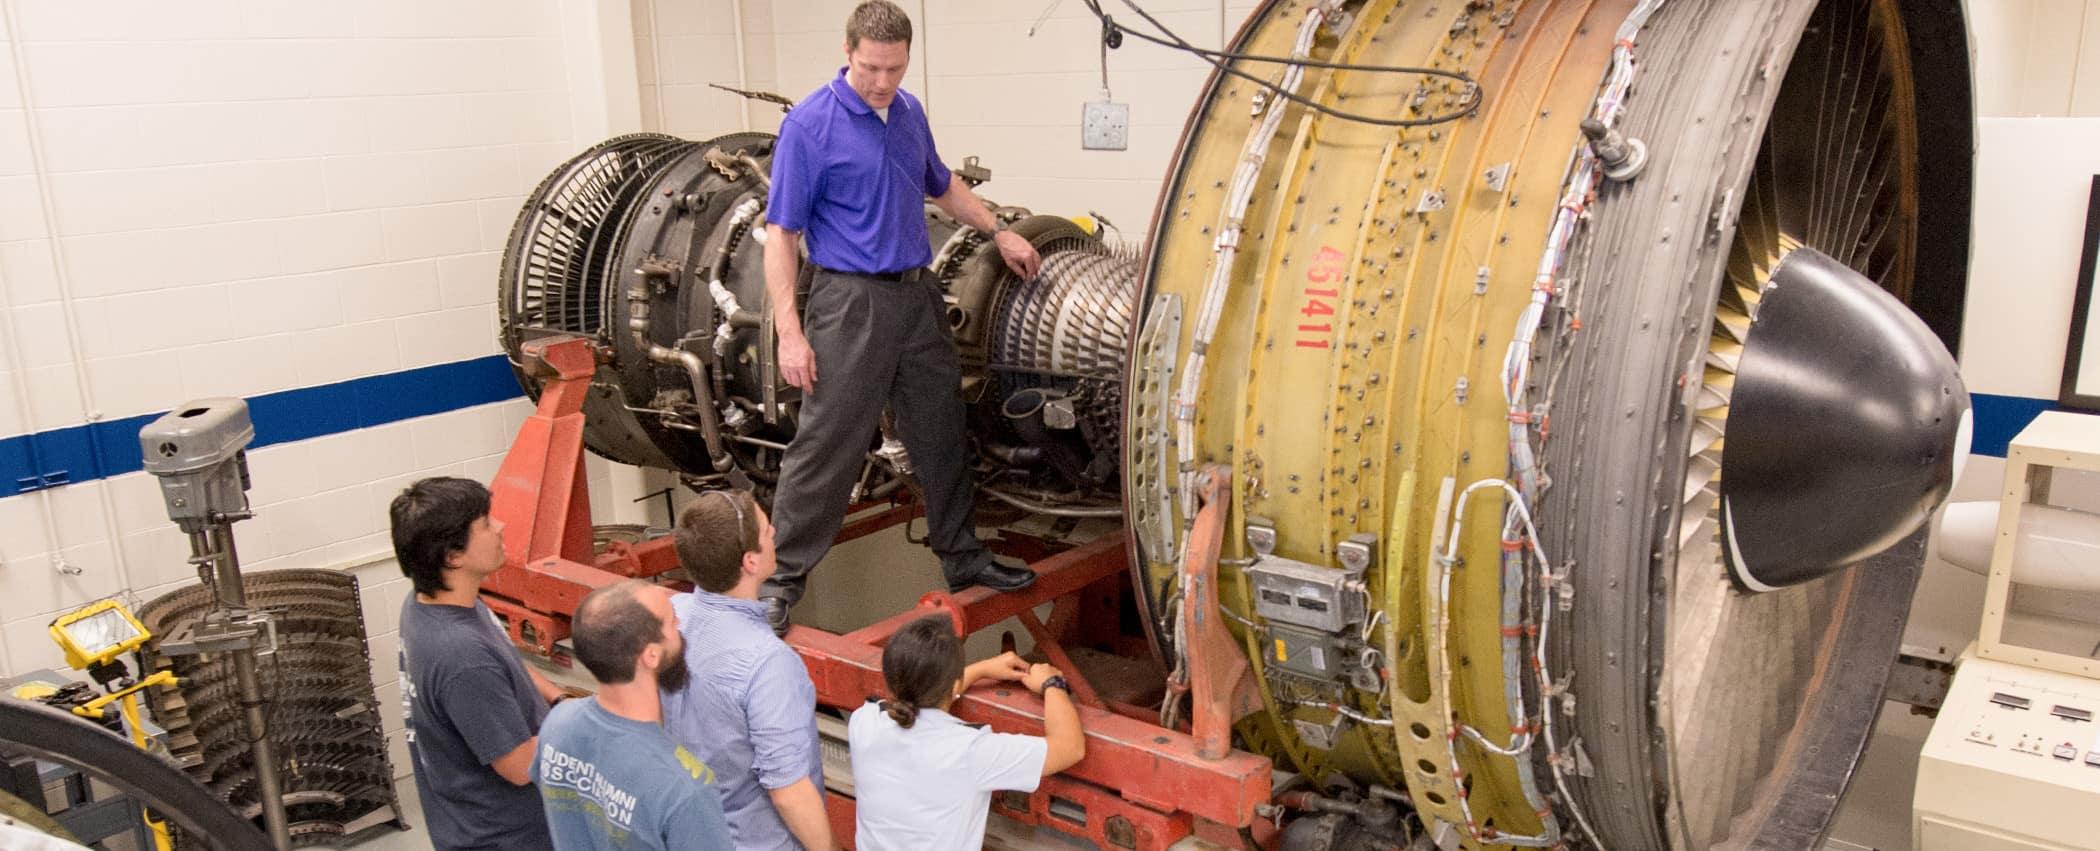 Degrees & Programs Embry-riddle Aeronautical University